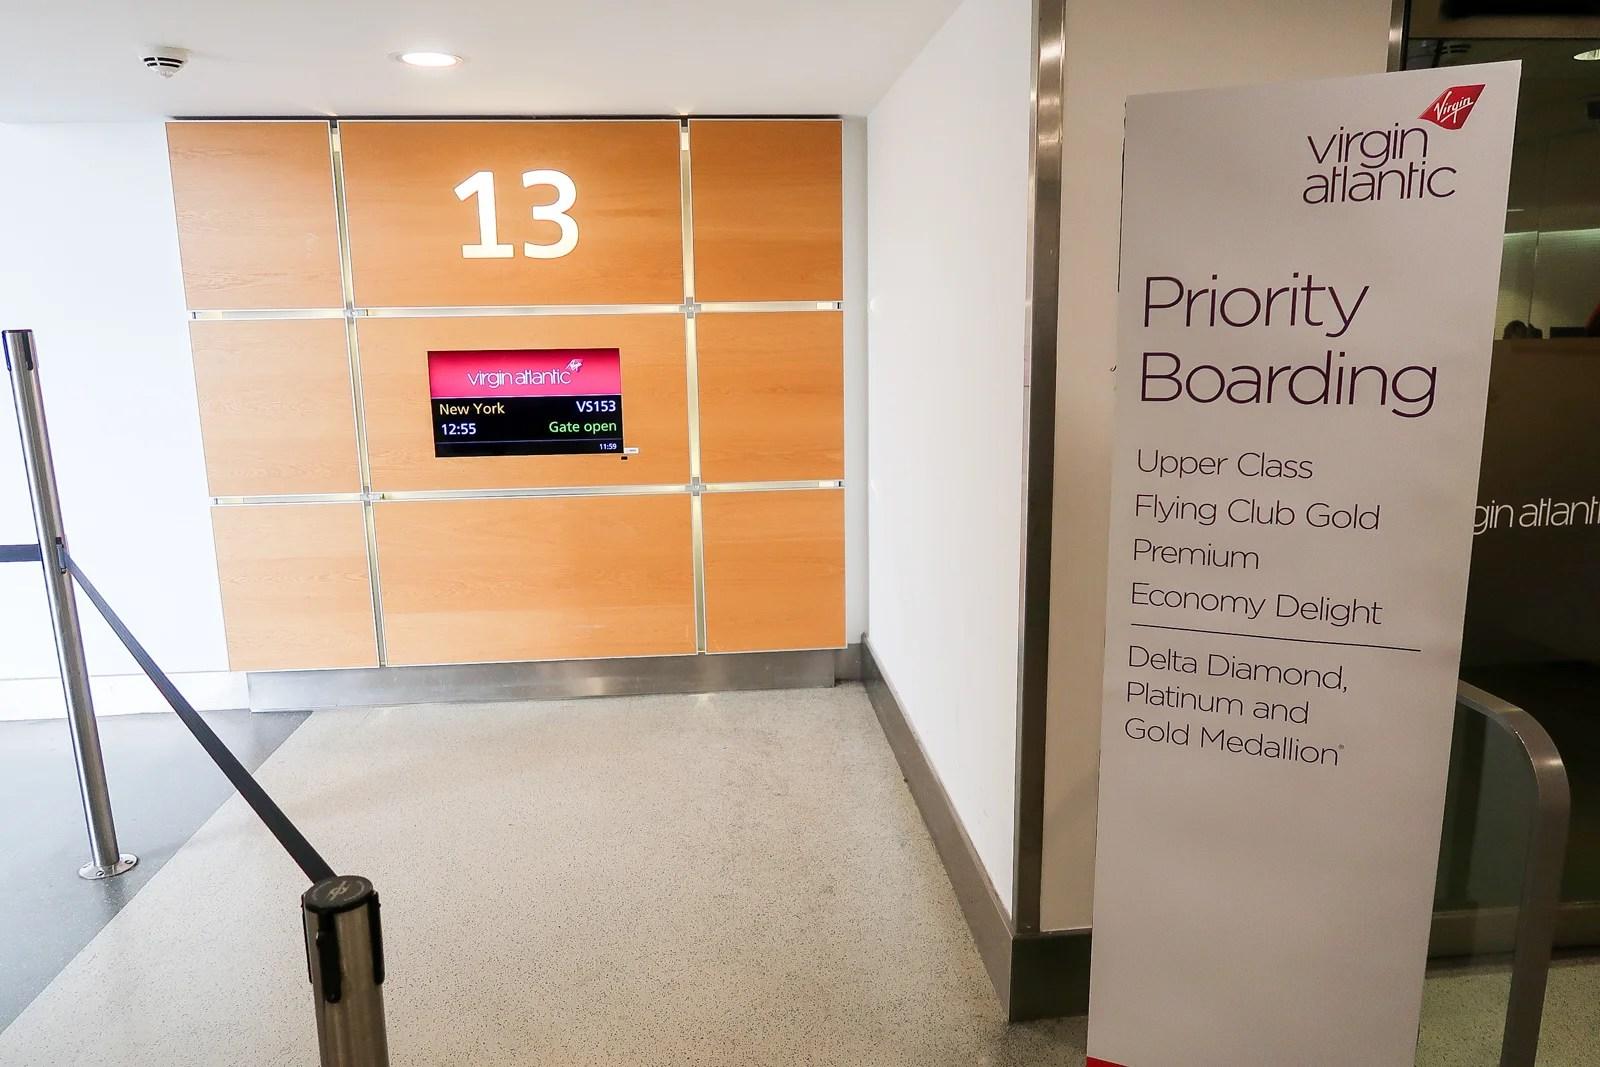 Review: Virgin Atlantic A330 Premium Economy LHR-JFK